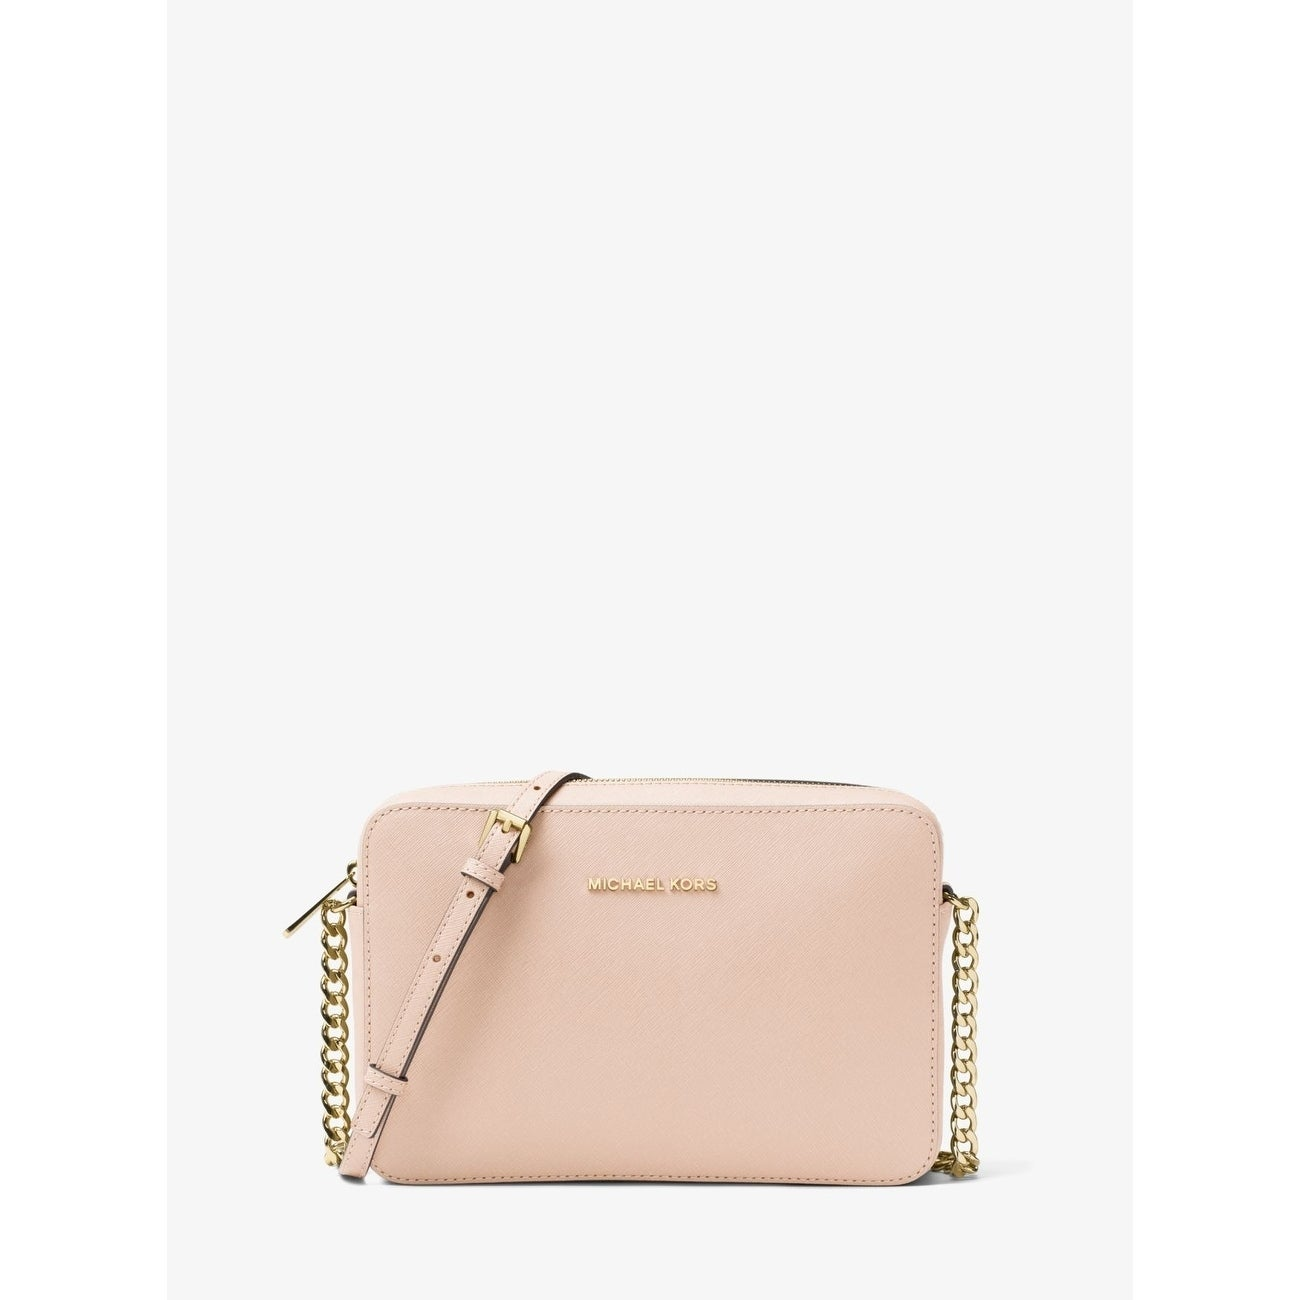 d2d7b8b43713 Buy Michael Kors Crossbody   Mini Bags Online at Overstock